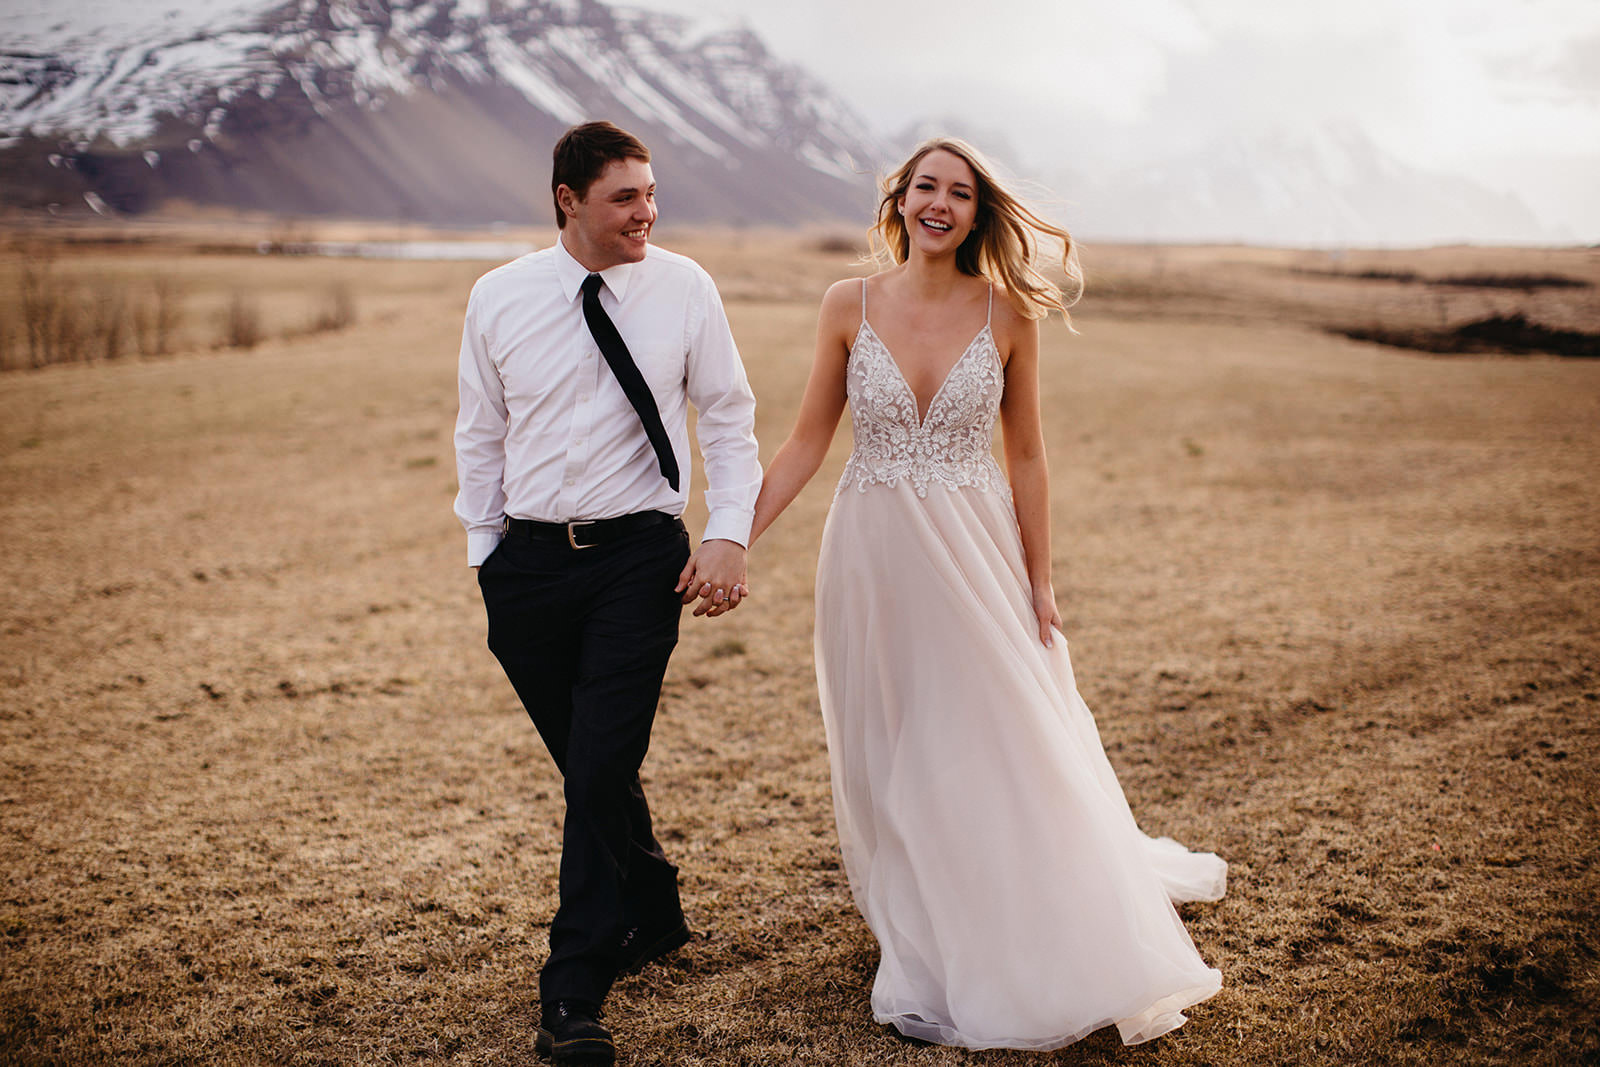 Icelandic Iceland Elopement Wedding Elope Photographer Eloping Reykjavík Vik Black Sand Beach Jökulsárlón Skogafoss Waterfall Vestrahorn Mountain Liz Osban Photography Destination 19.jpg